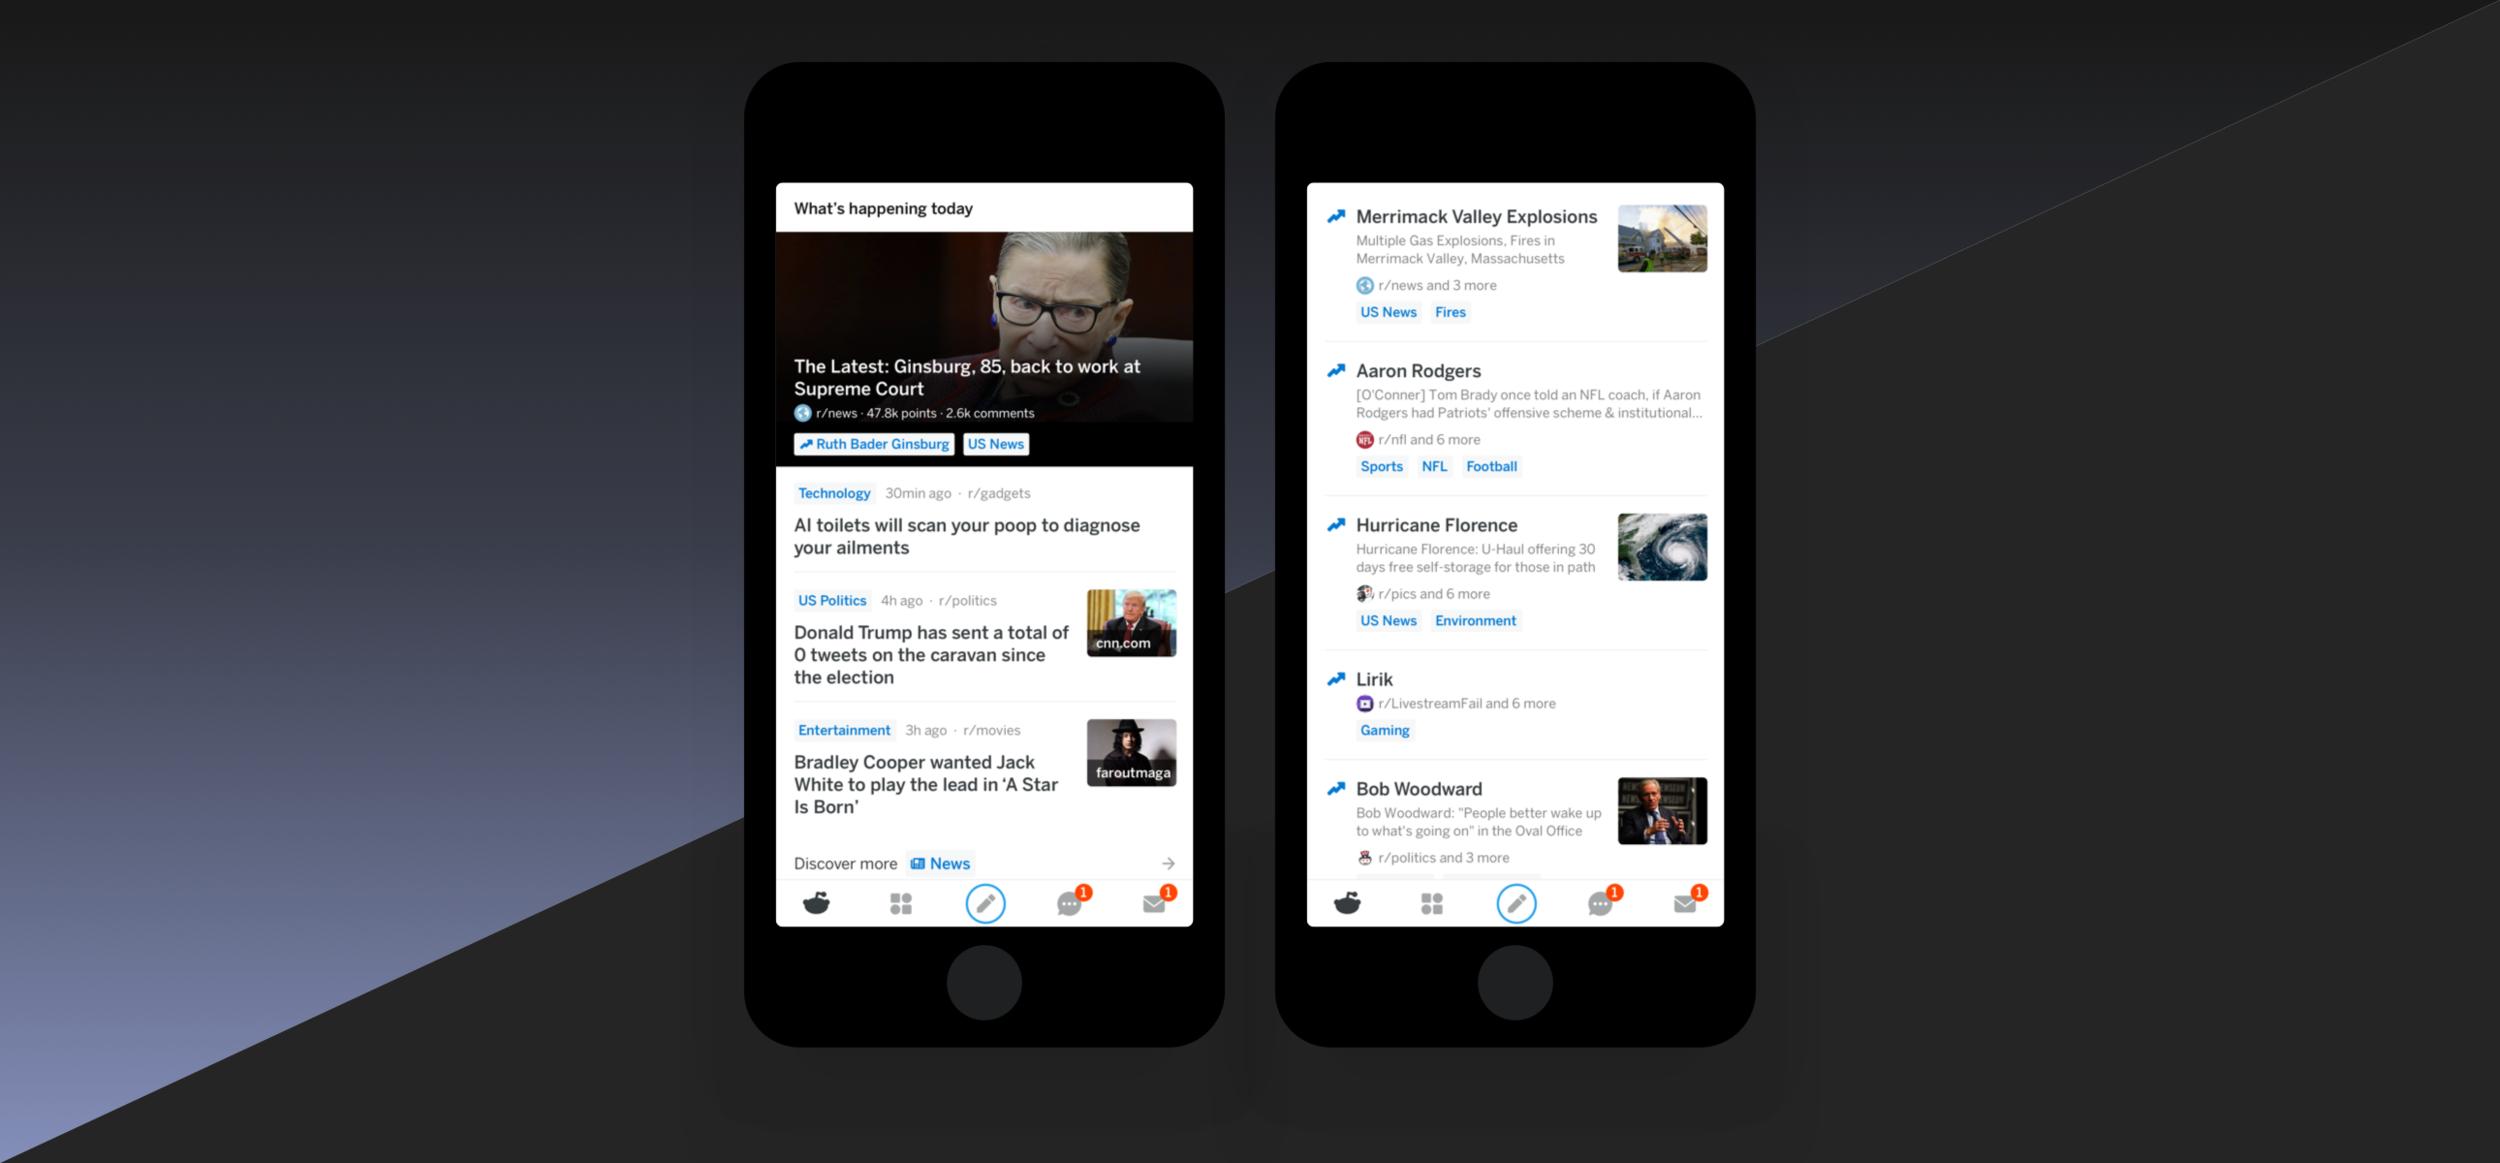 reddit-news-empty-state-header.png